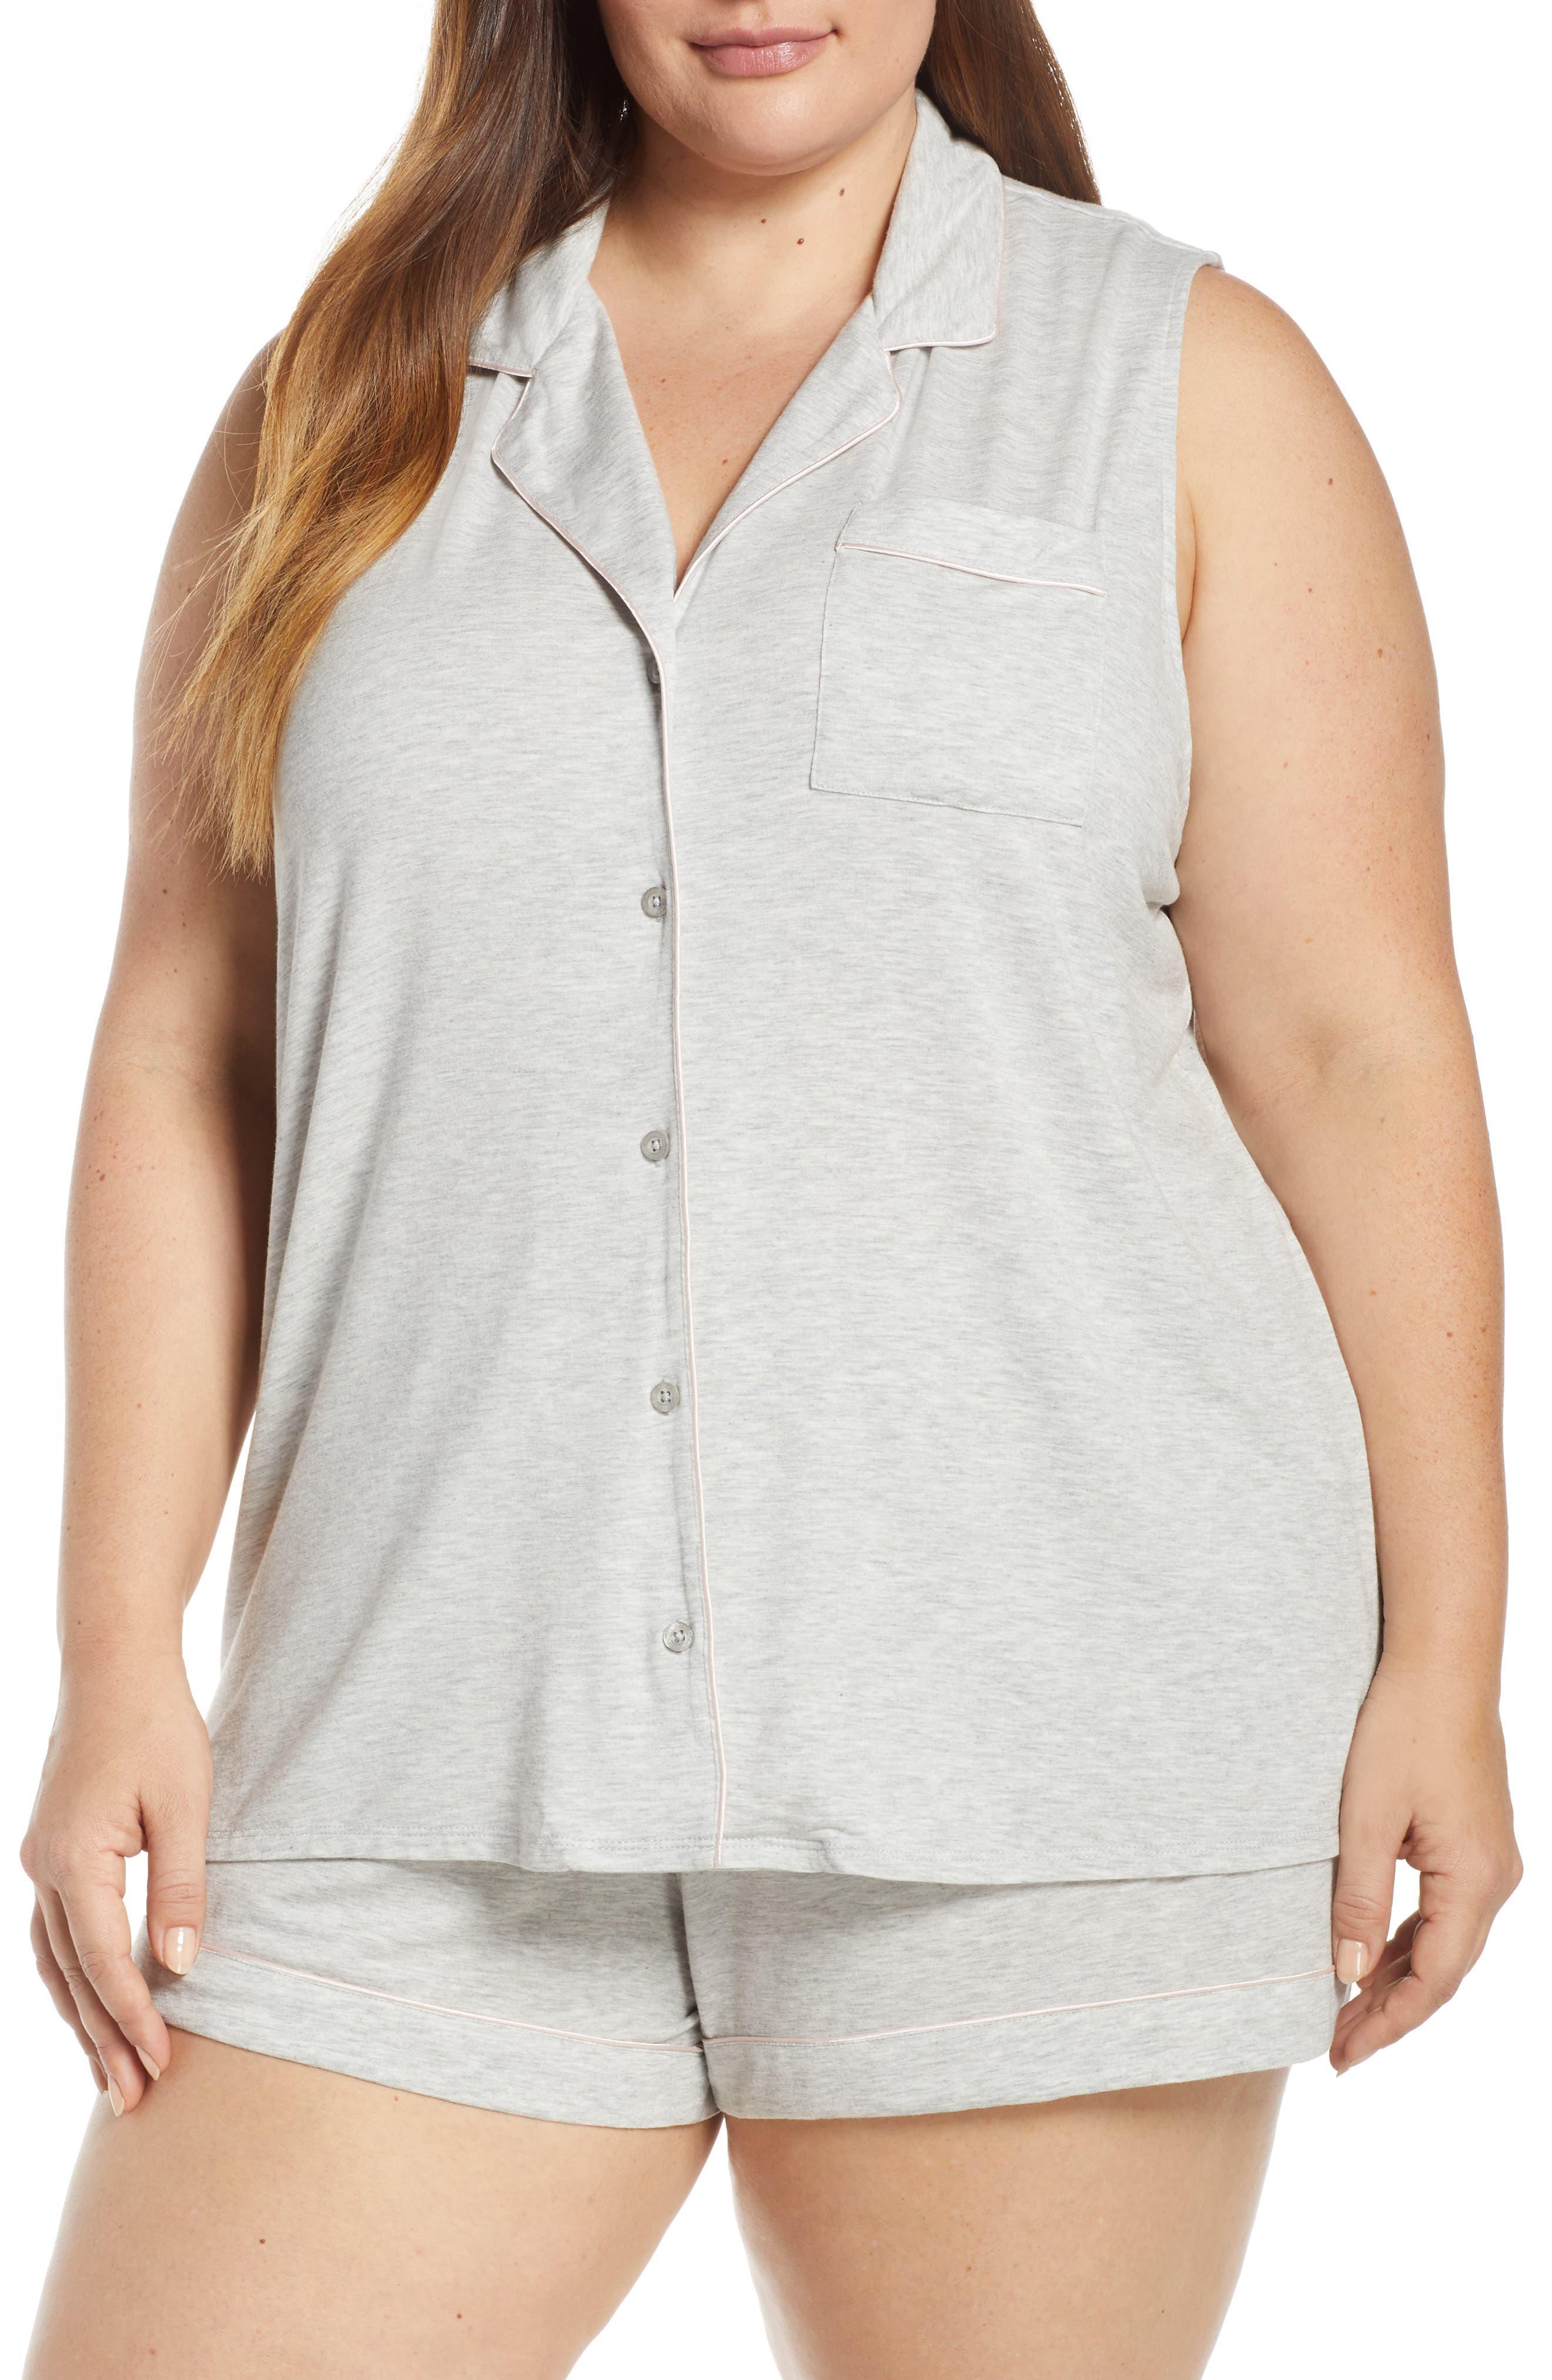 NORDSTROM LINGERIE Moonlight Short Pajamas, Main, color, GREY PEARL HEATHER